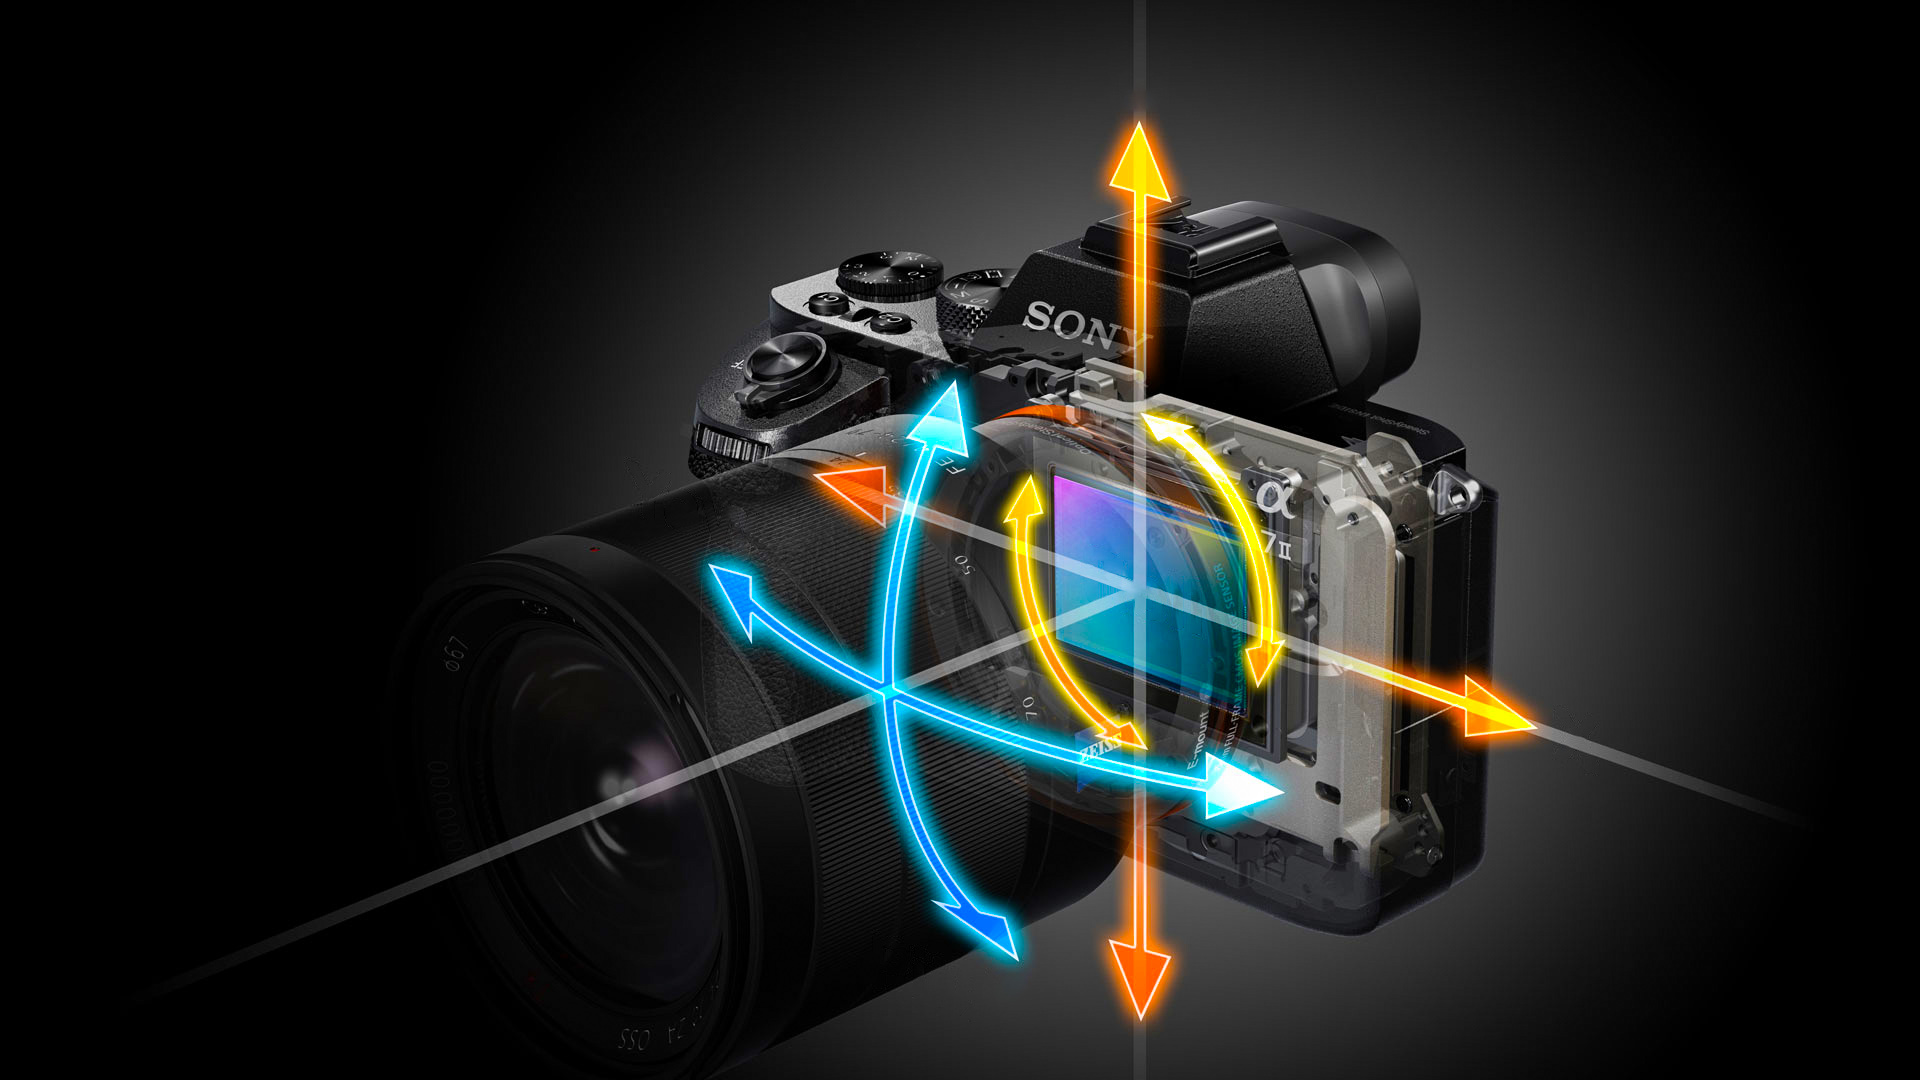 Стабилизация изображения необходима во время съёмки в условиях низкой освещенности